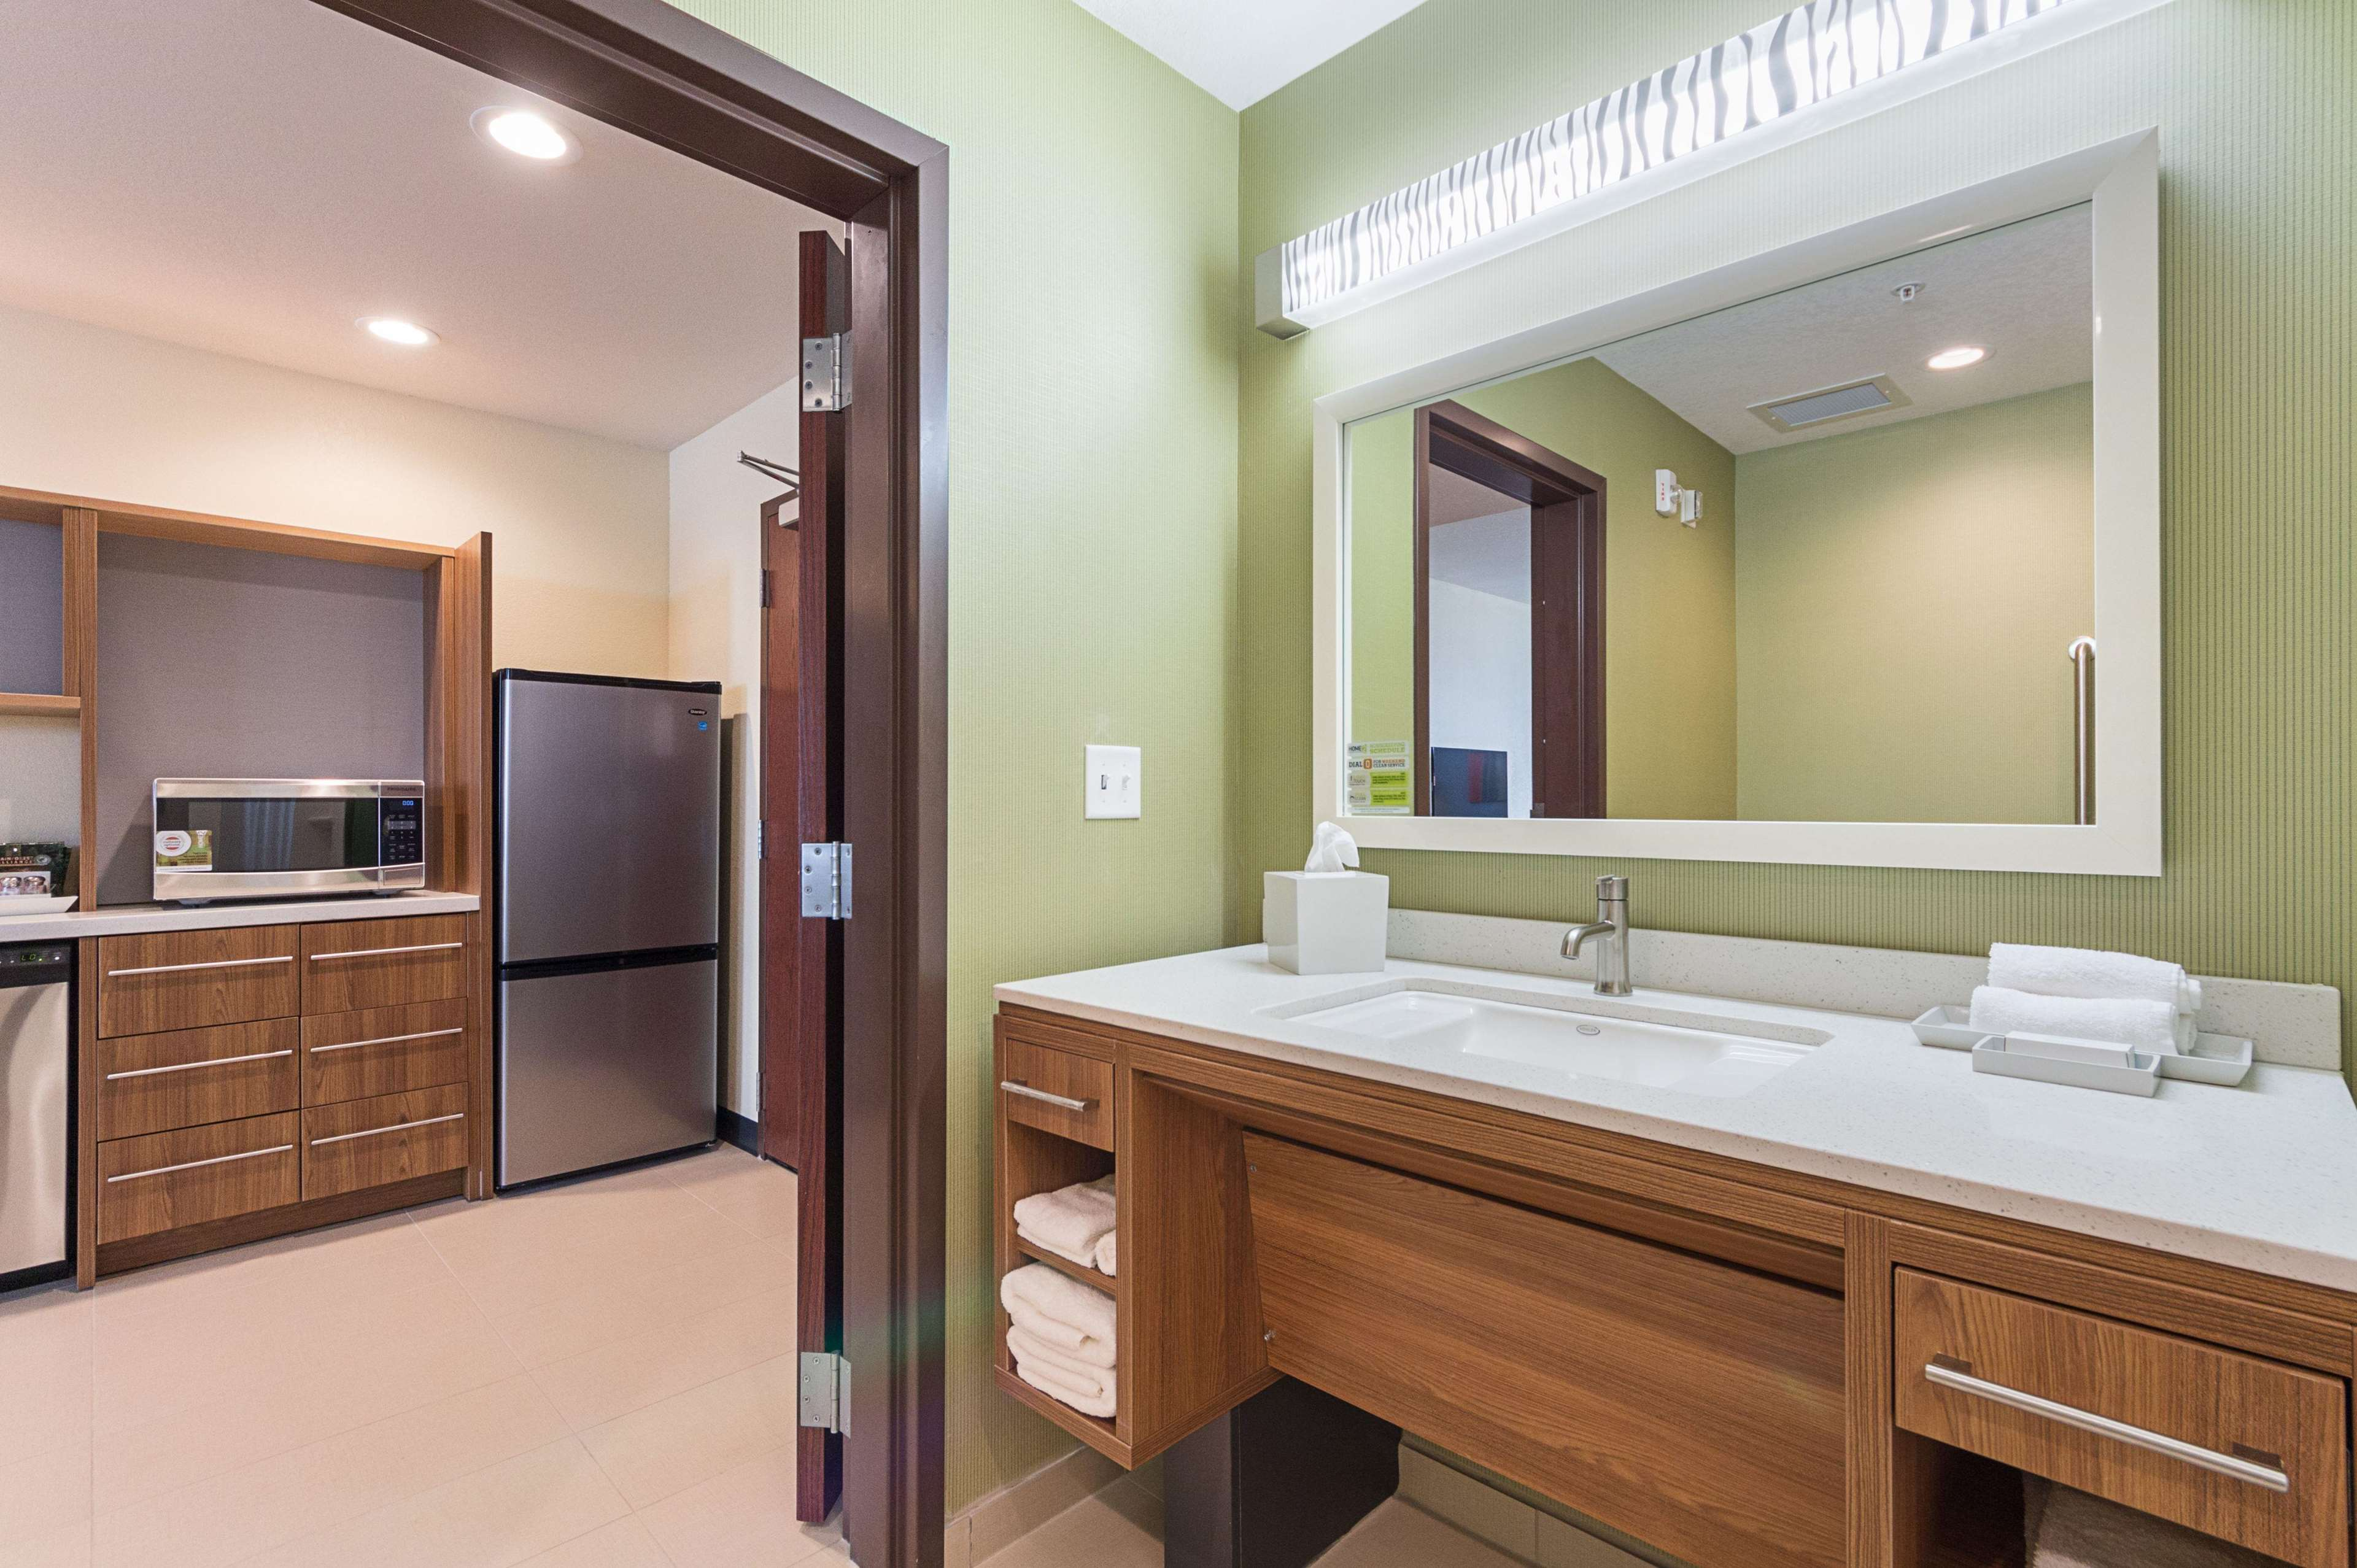 Home 2 Suites by Hilton - Yukon image 38